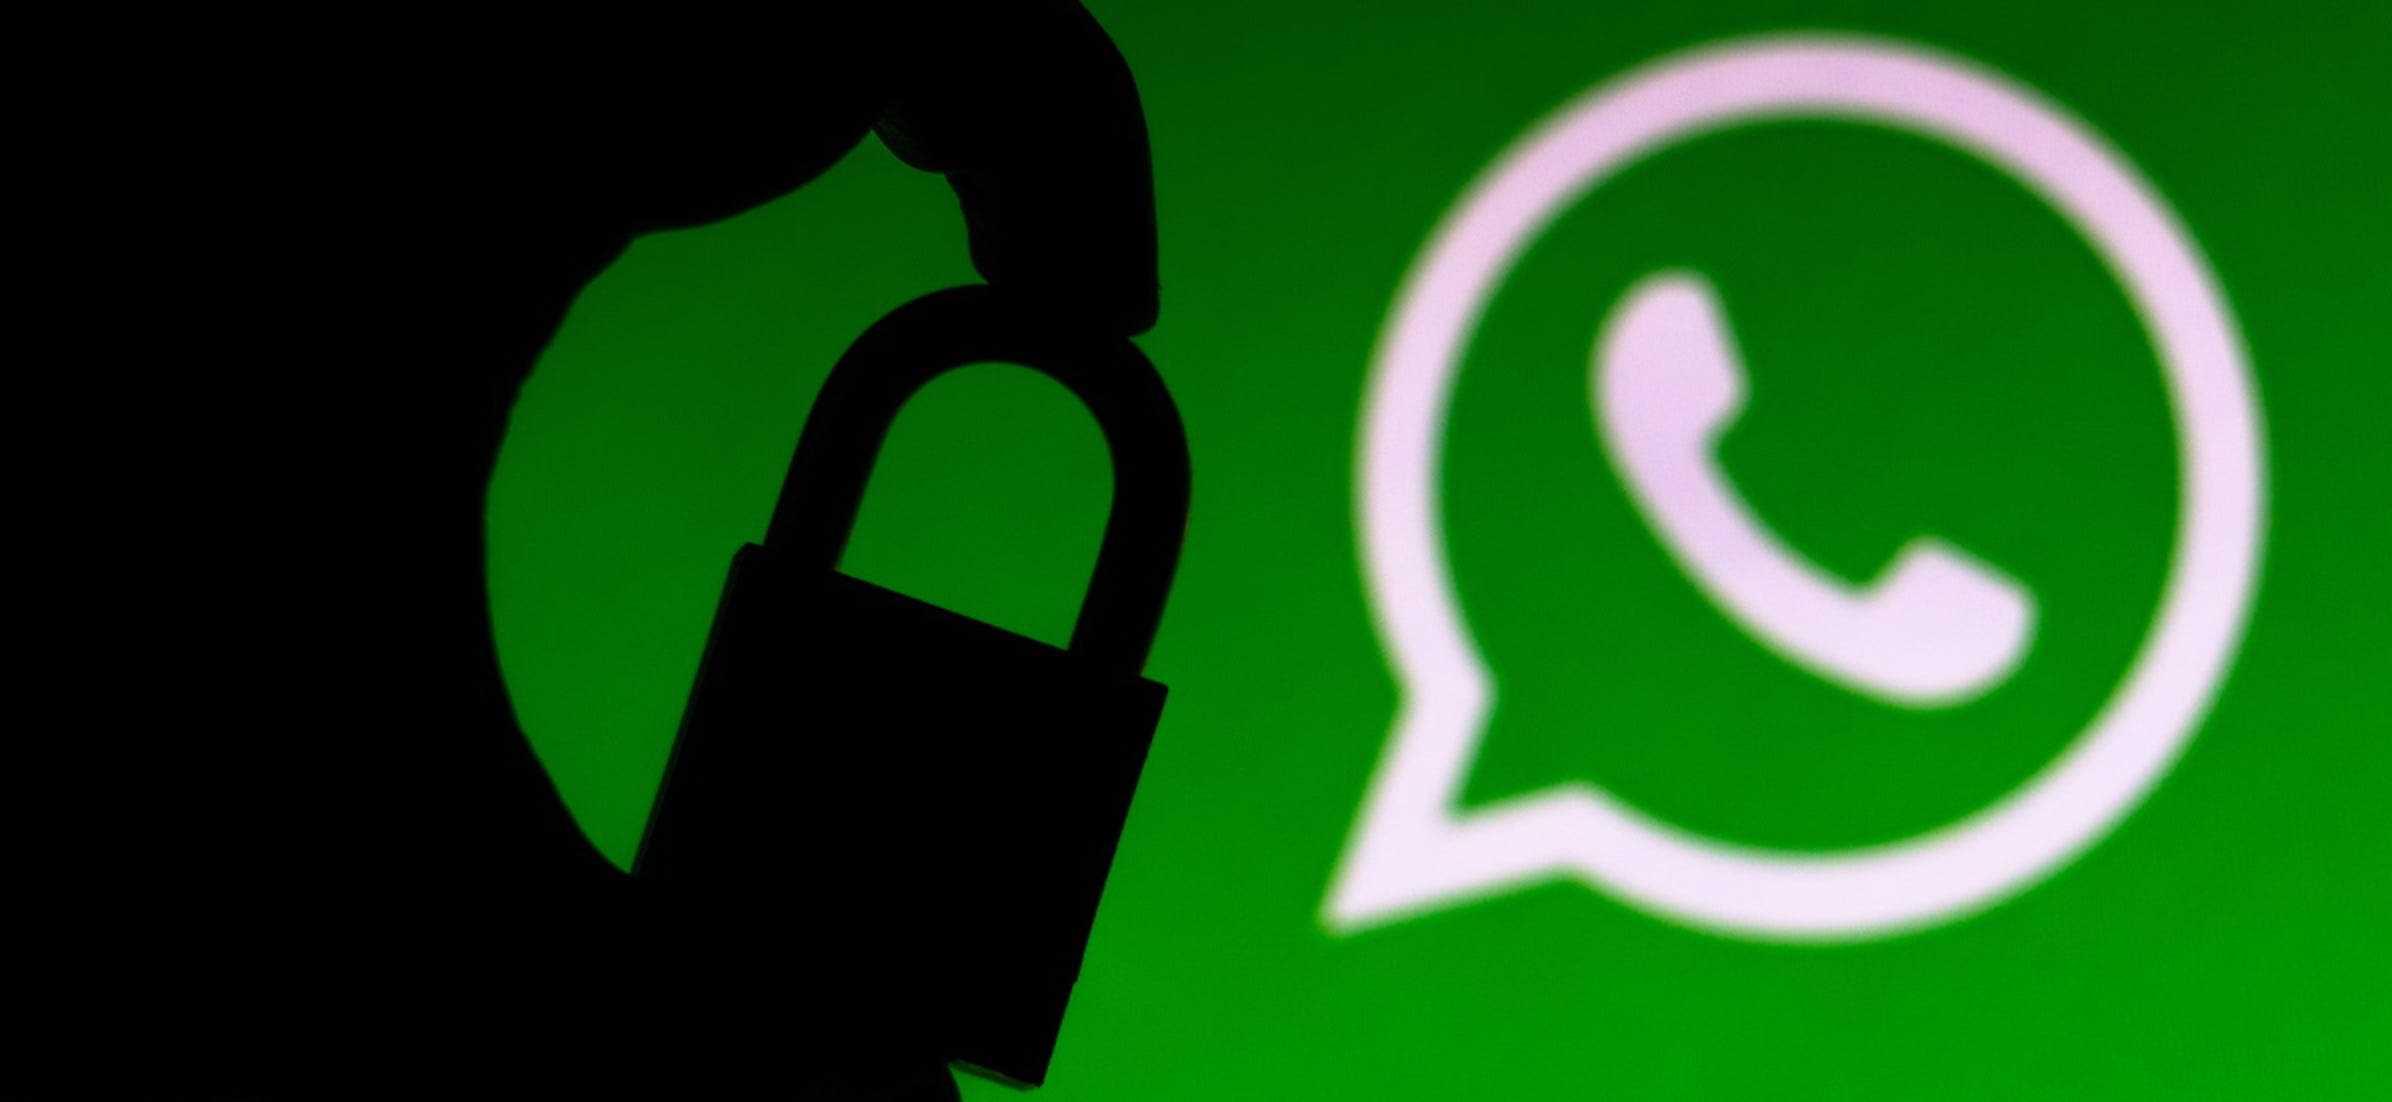 Whatsapp Warns Using Gb Whatsapp Can Get You Banned Gizchina Com